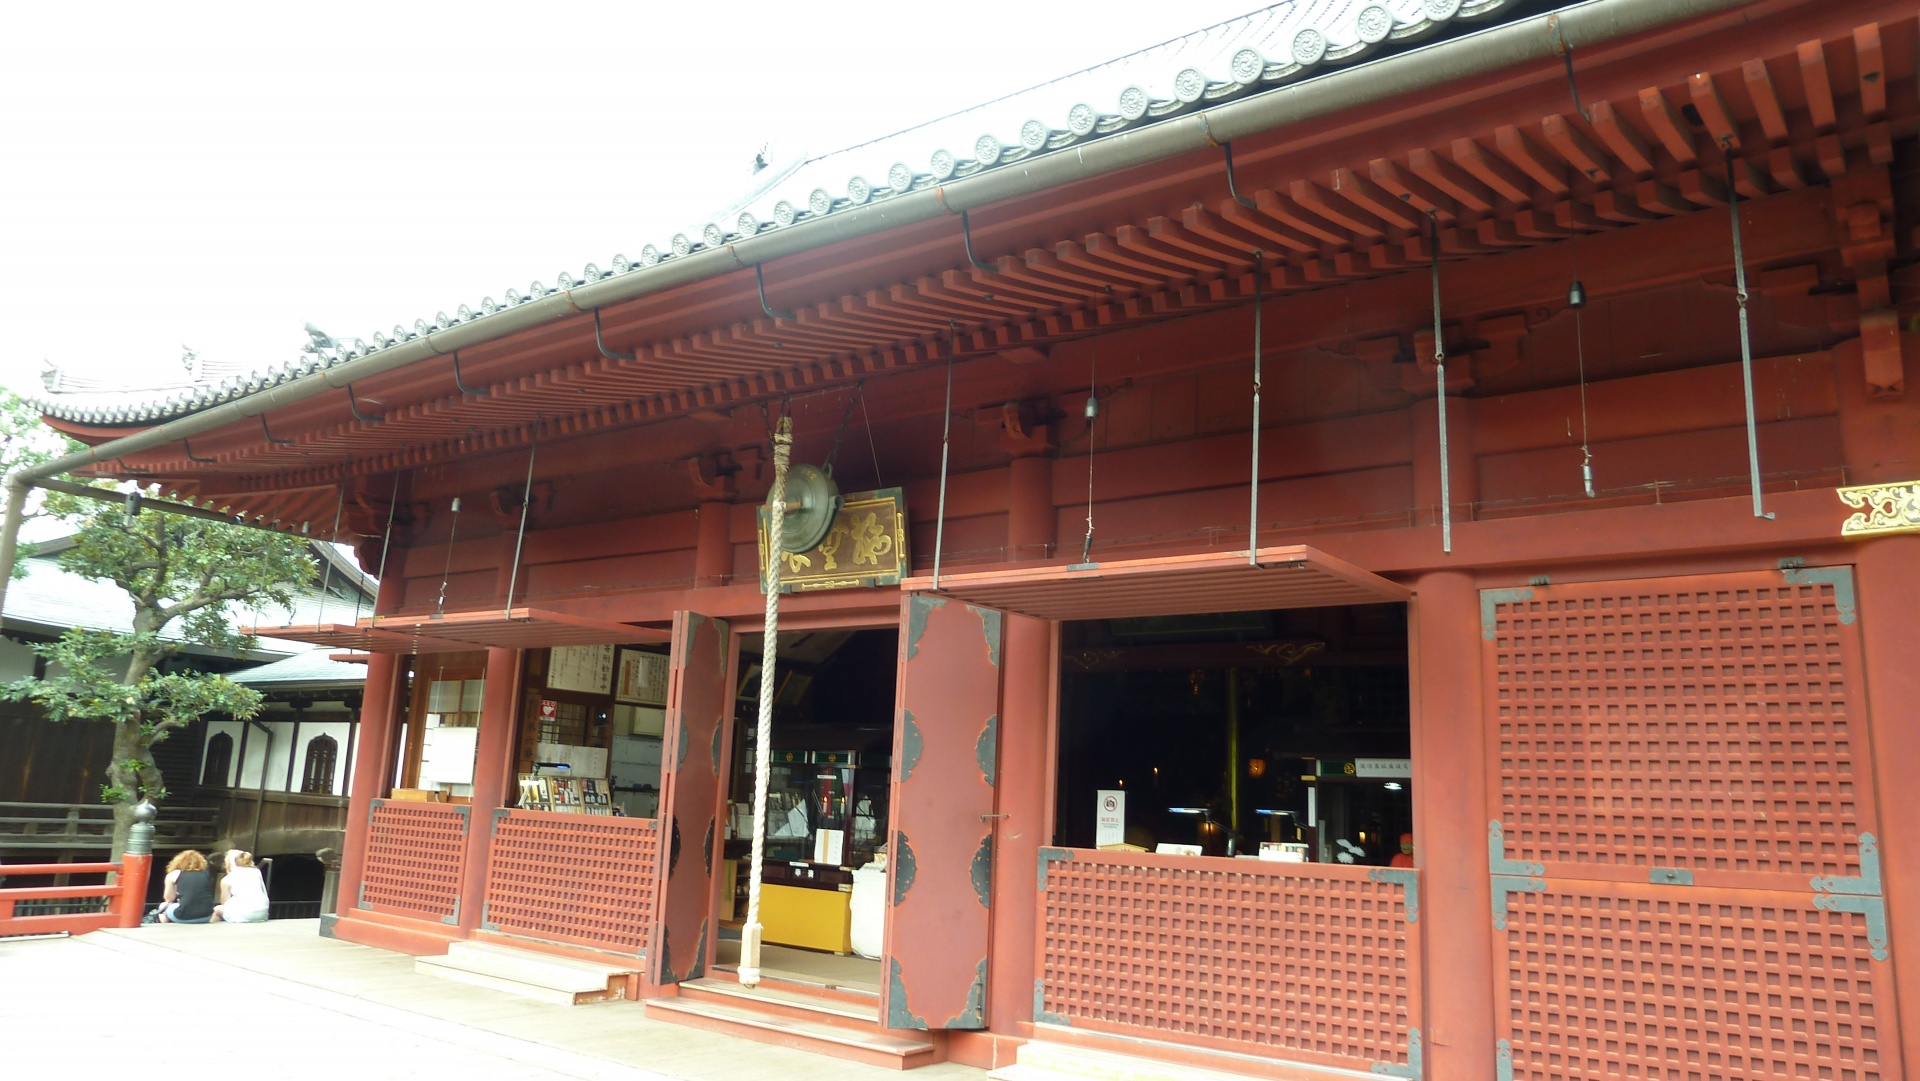 Helligdom i Ueno-parken